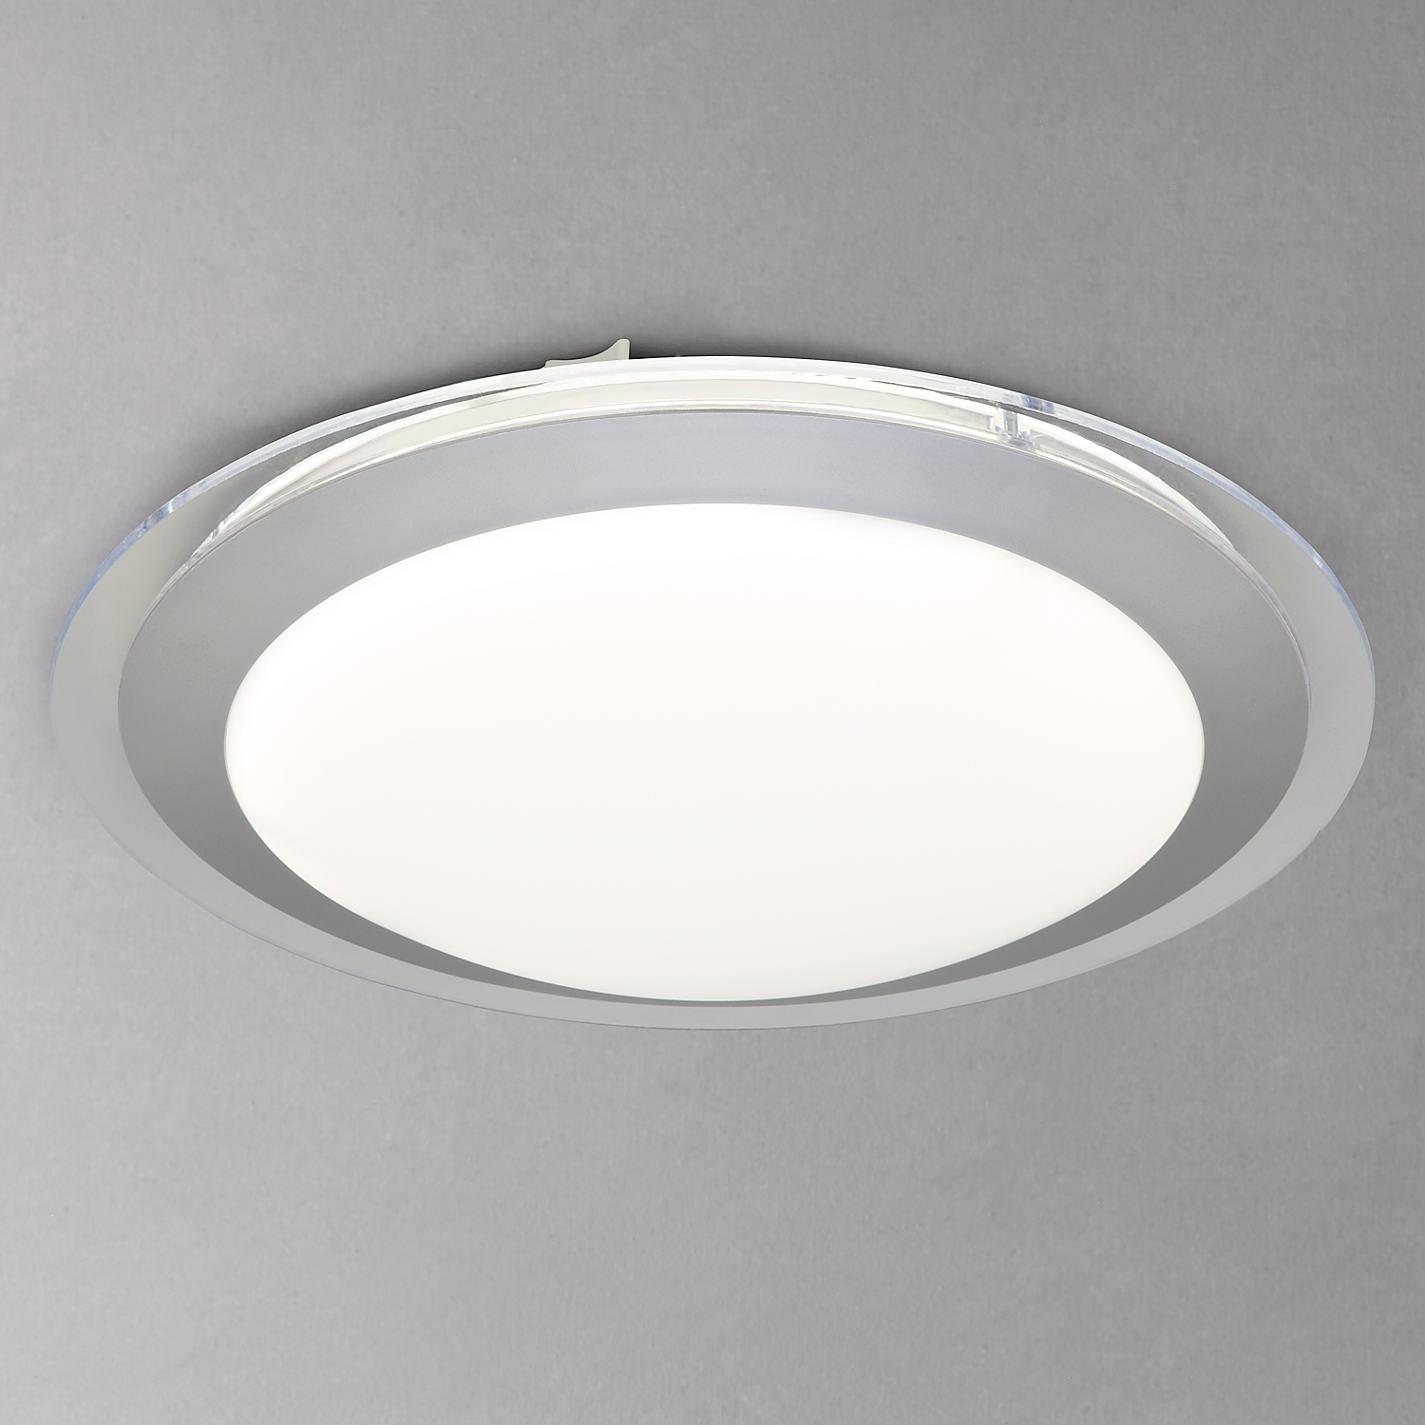 John Lewis Bathroom Ceiling Lights Lighting Led Wall Uk Light Within John Lewis Outdoor Ceiling Lights (#11 of 15)